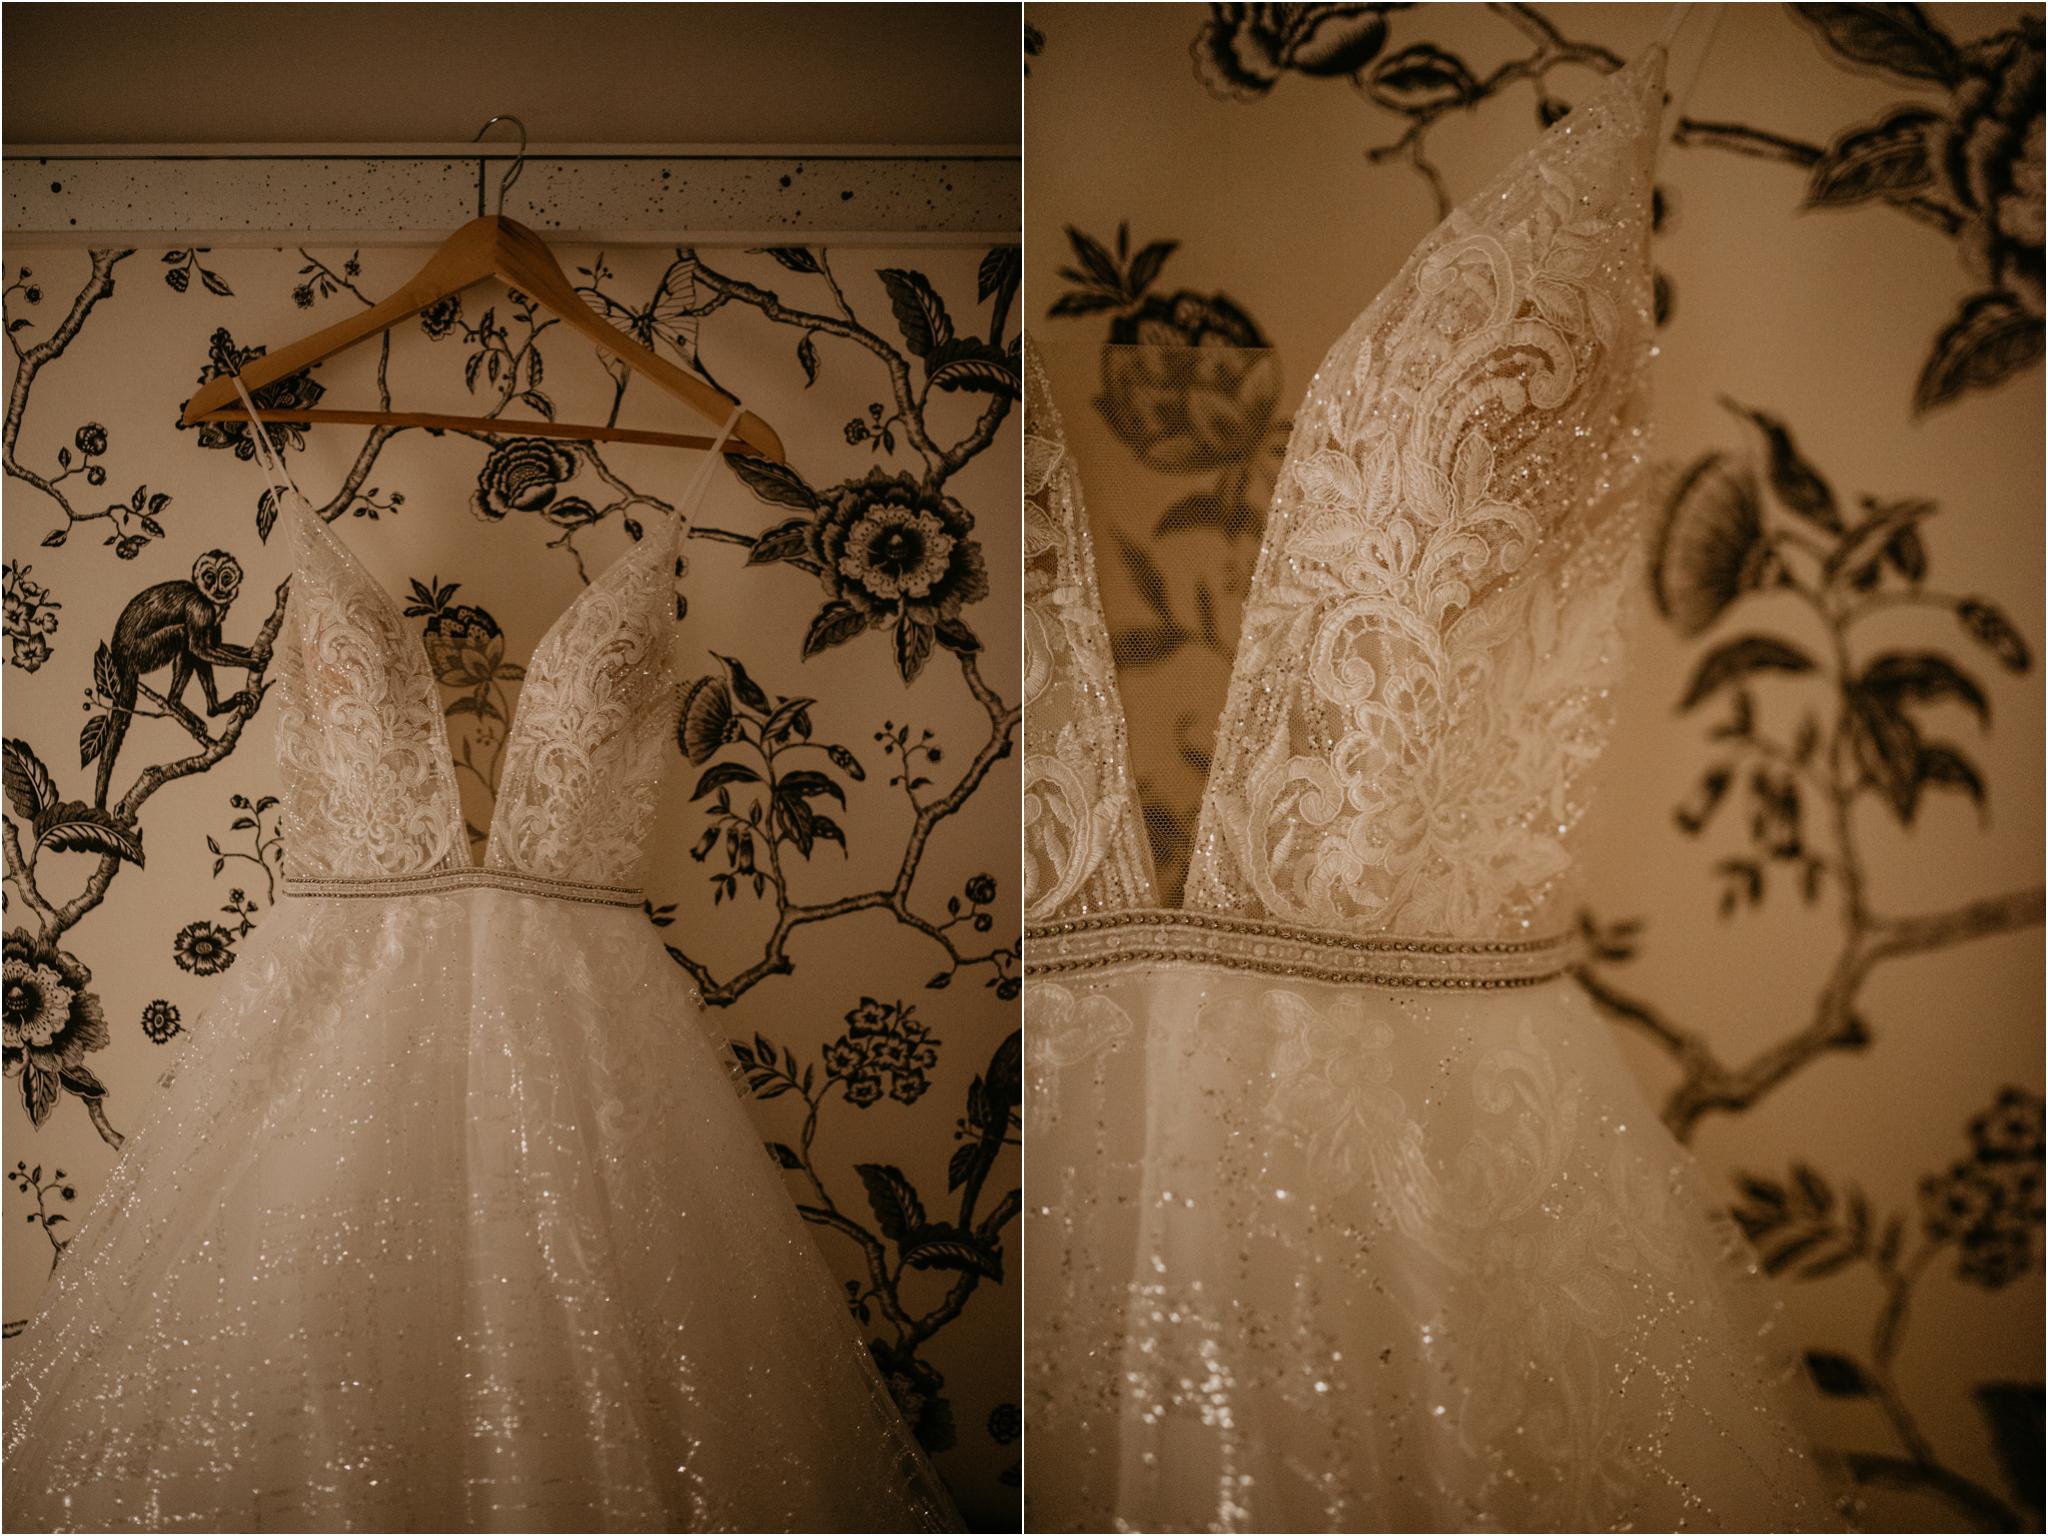 miranda-and-jared-paris-elopement-destination-wedding-photographer-002.jpg